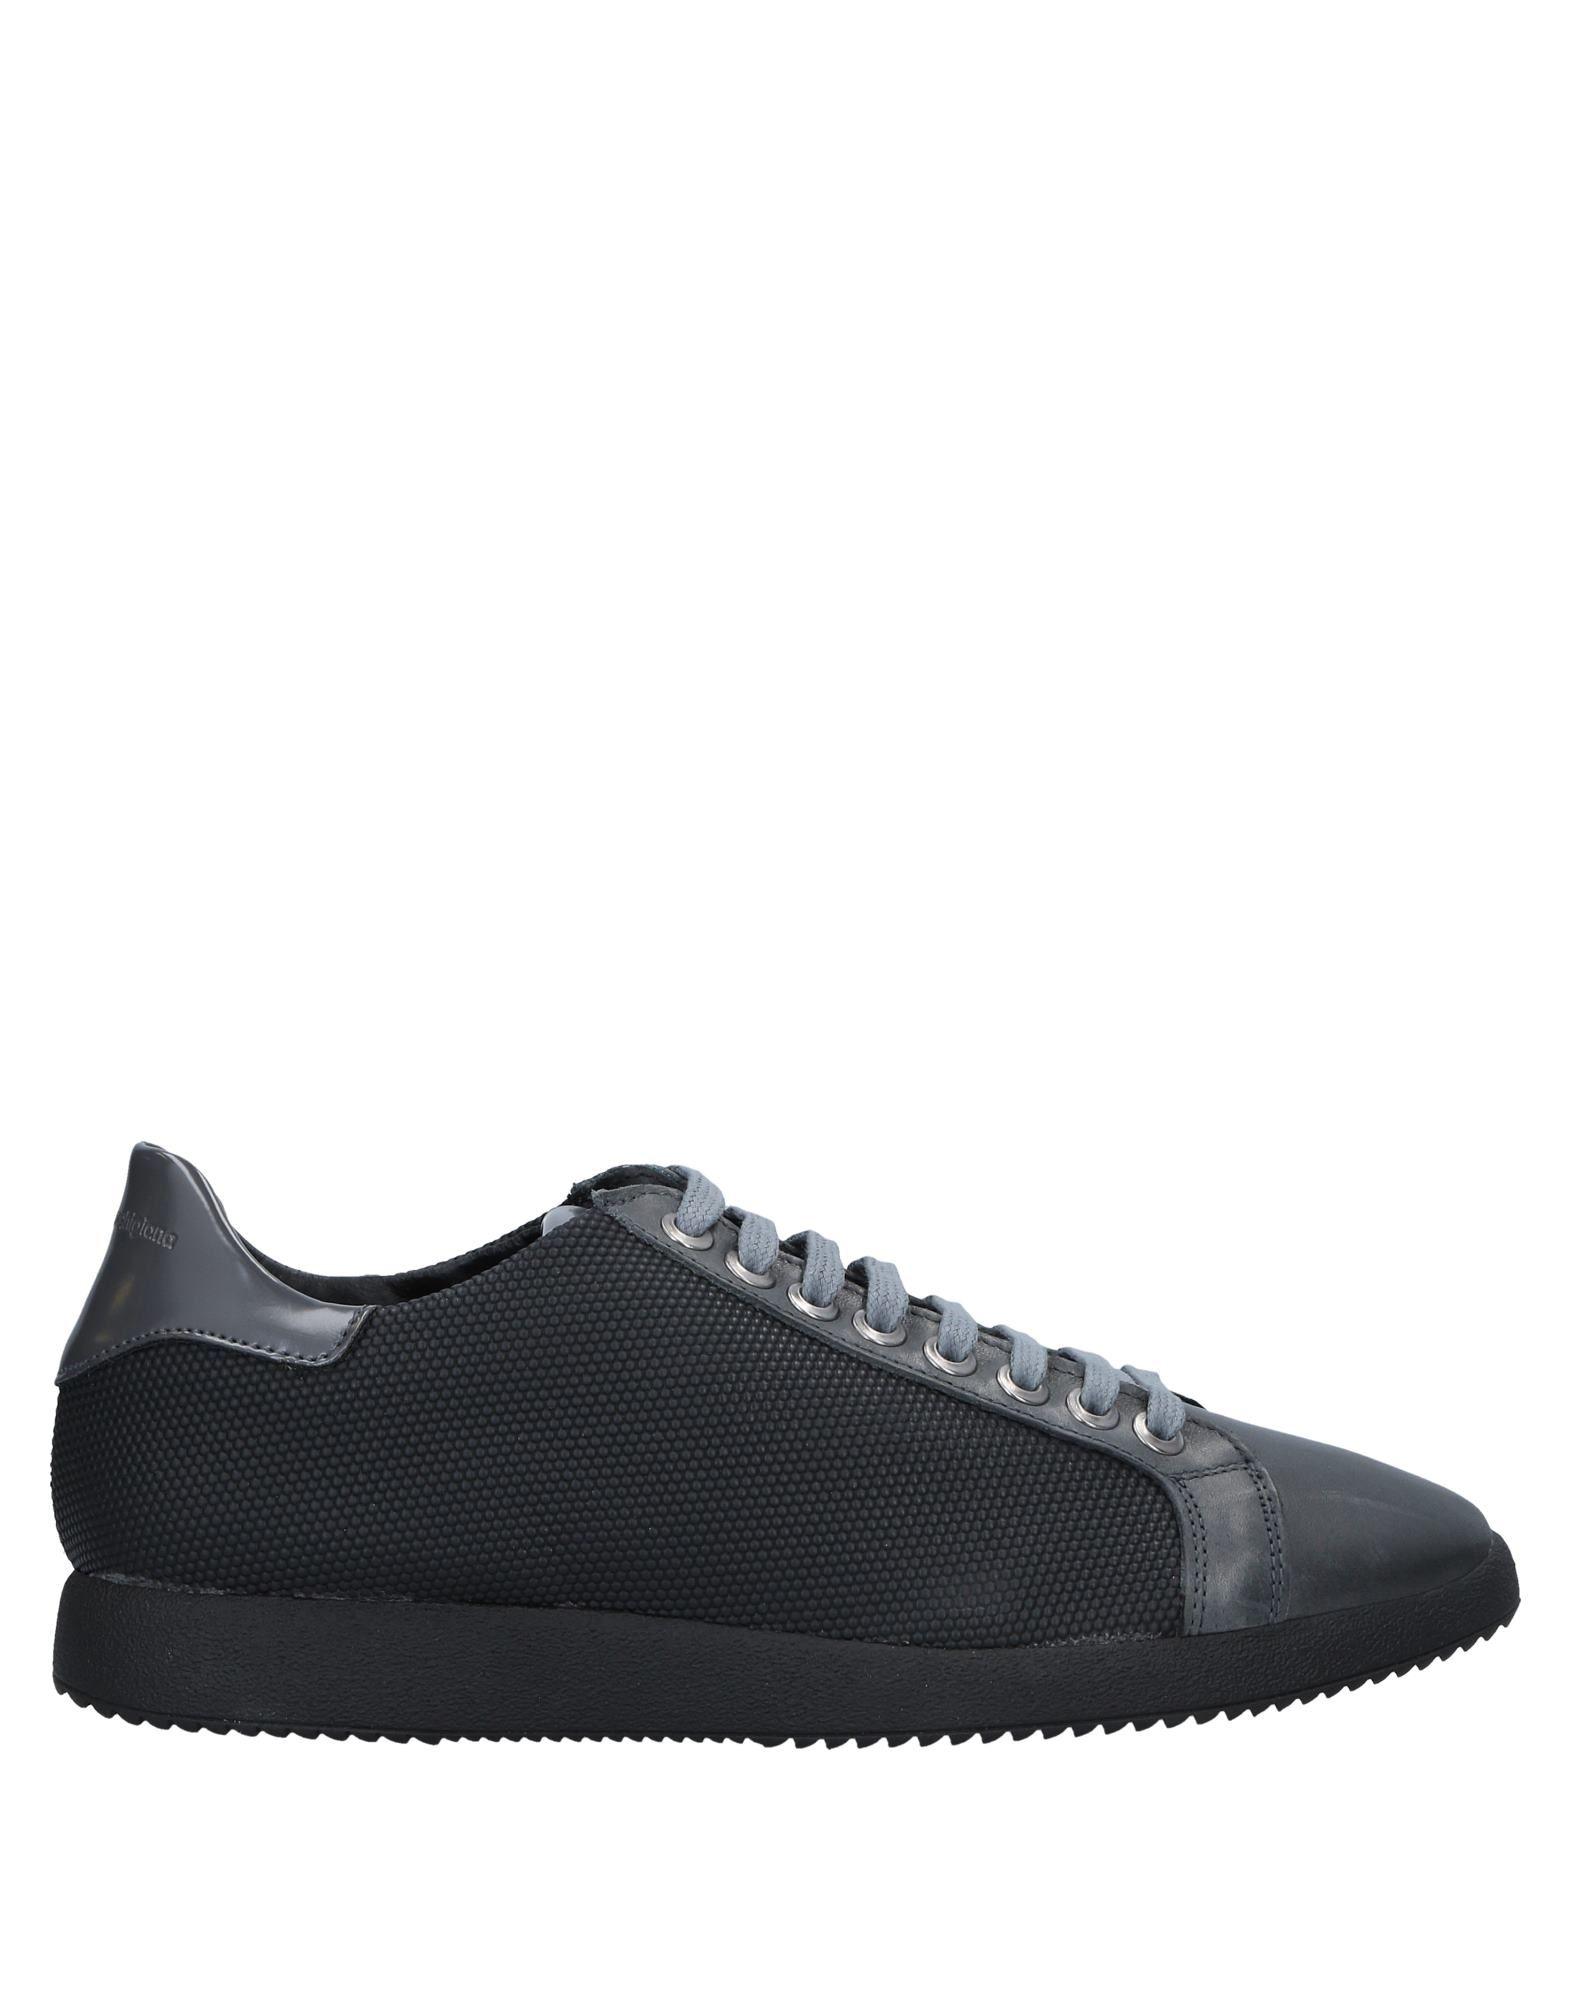 Sneakers Bottega Marchigiana Uomo - 11543931CL